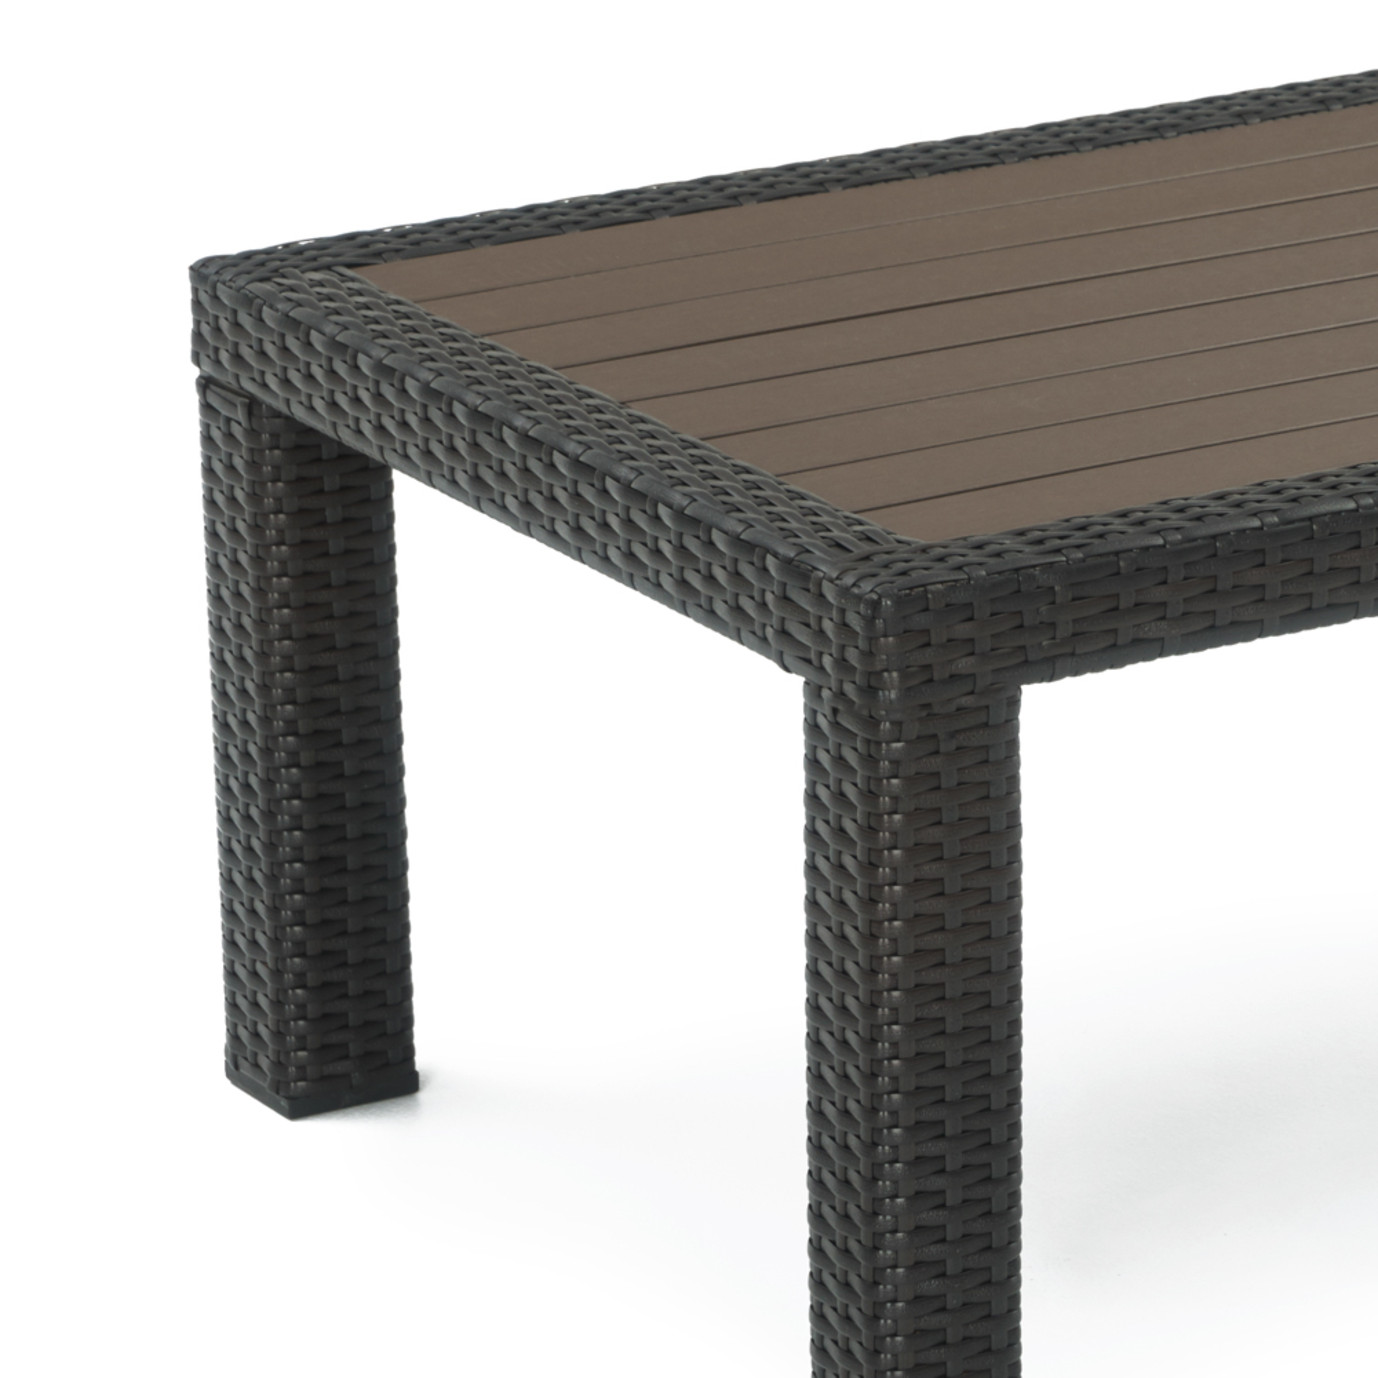 Deco™ 8pc Sofa & Club Chair Set - Wisteria Lavender Design